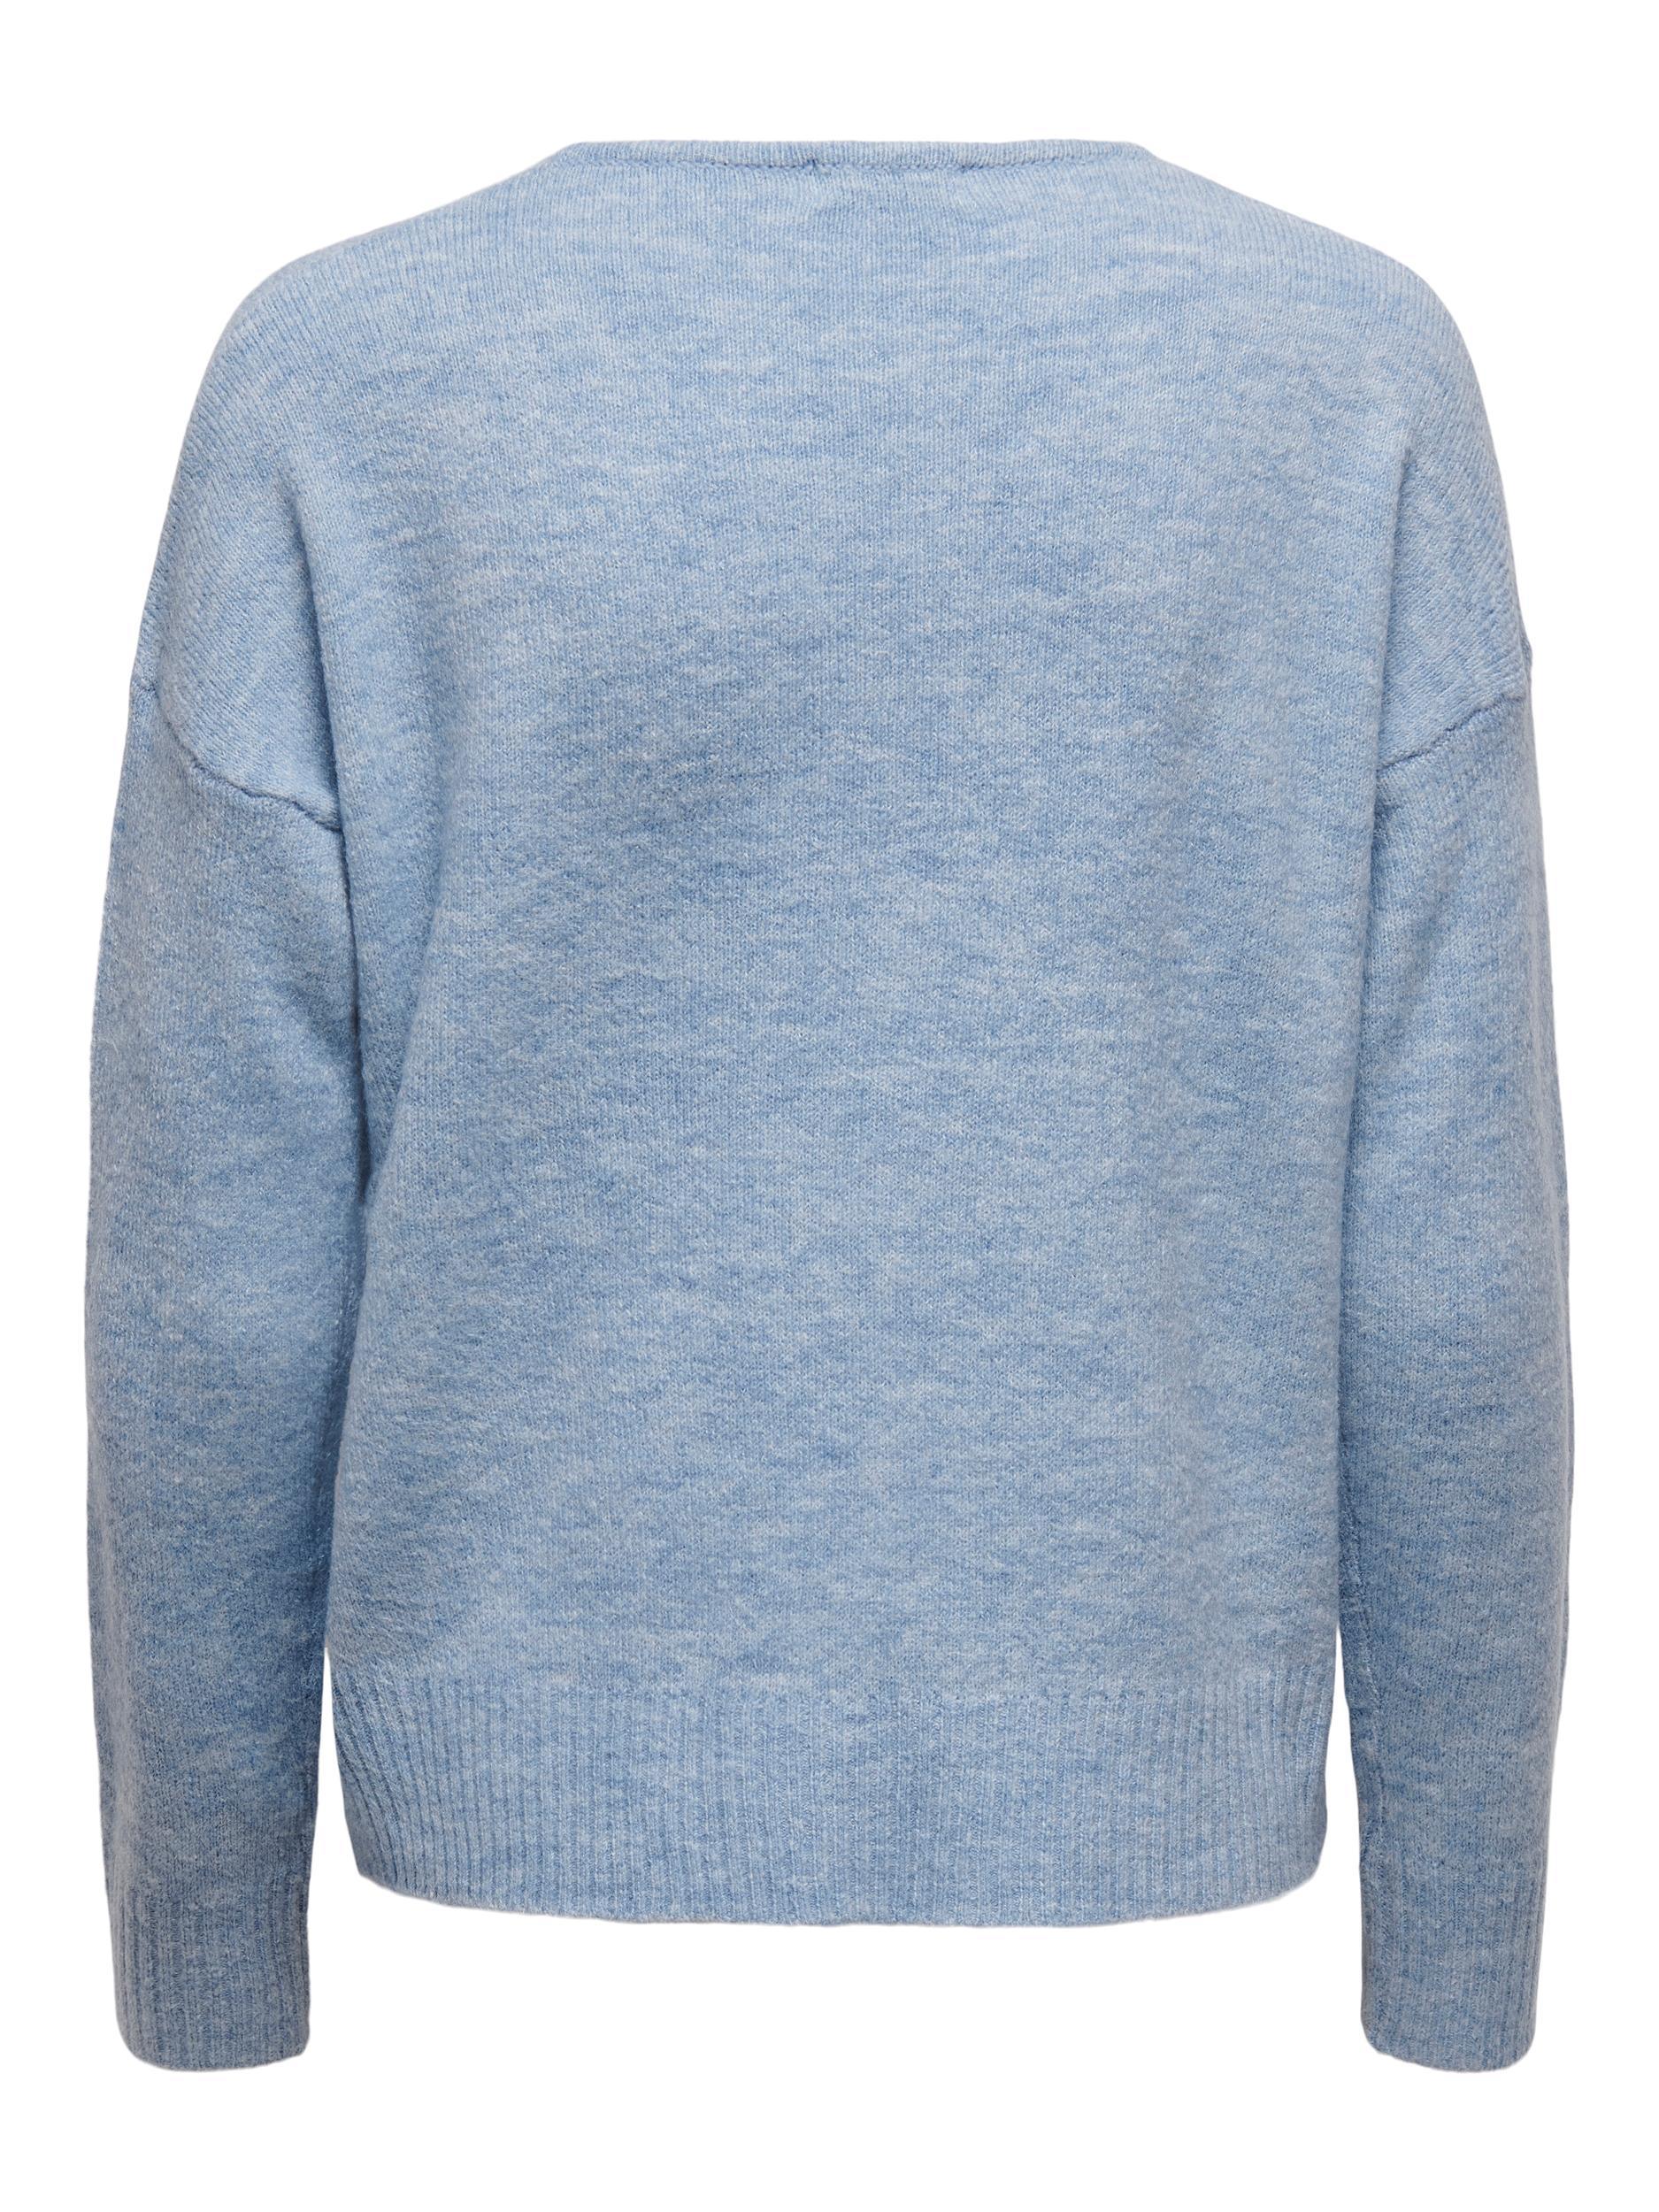 Jacqueline de Yong Elanora bluse, light blue, medium